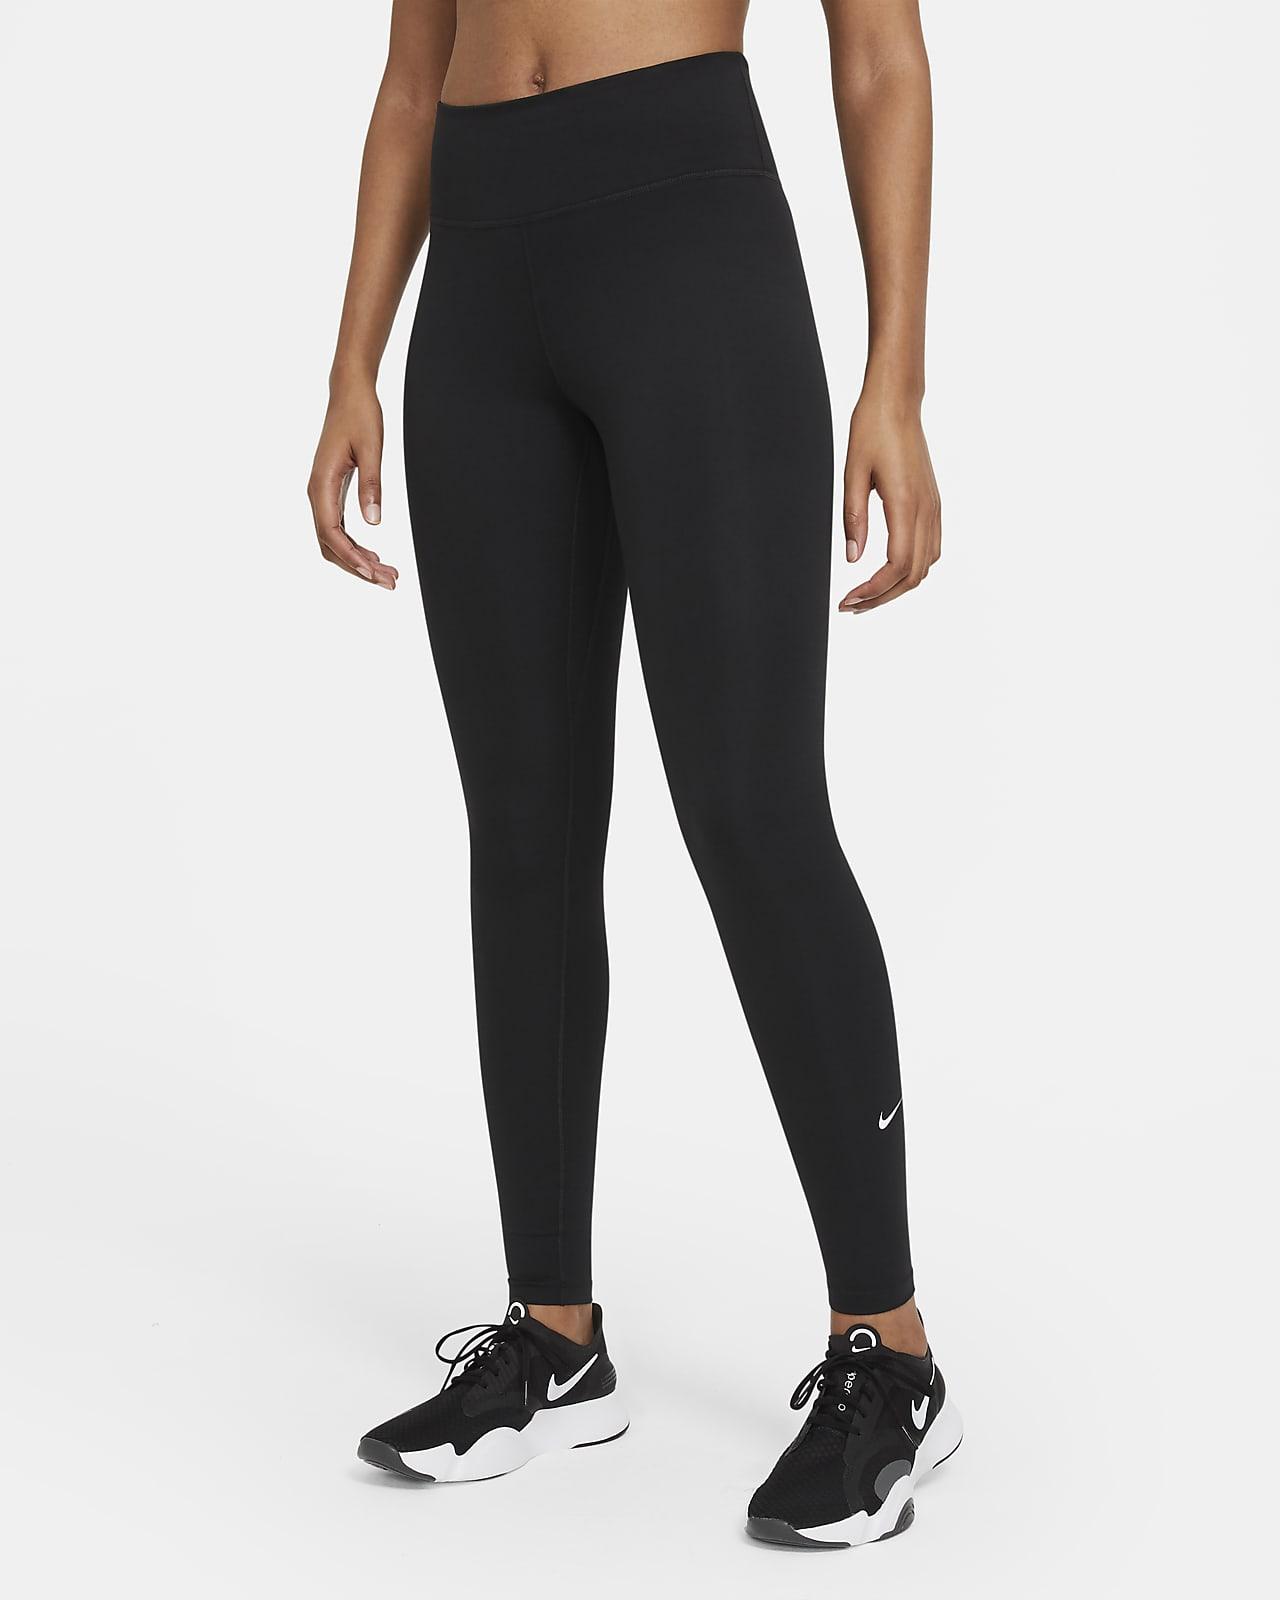 Legging taille mi-basse Nike Dri-FIT One pour Femme